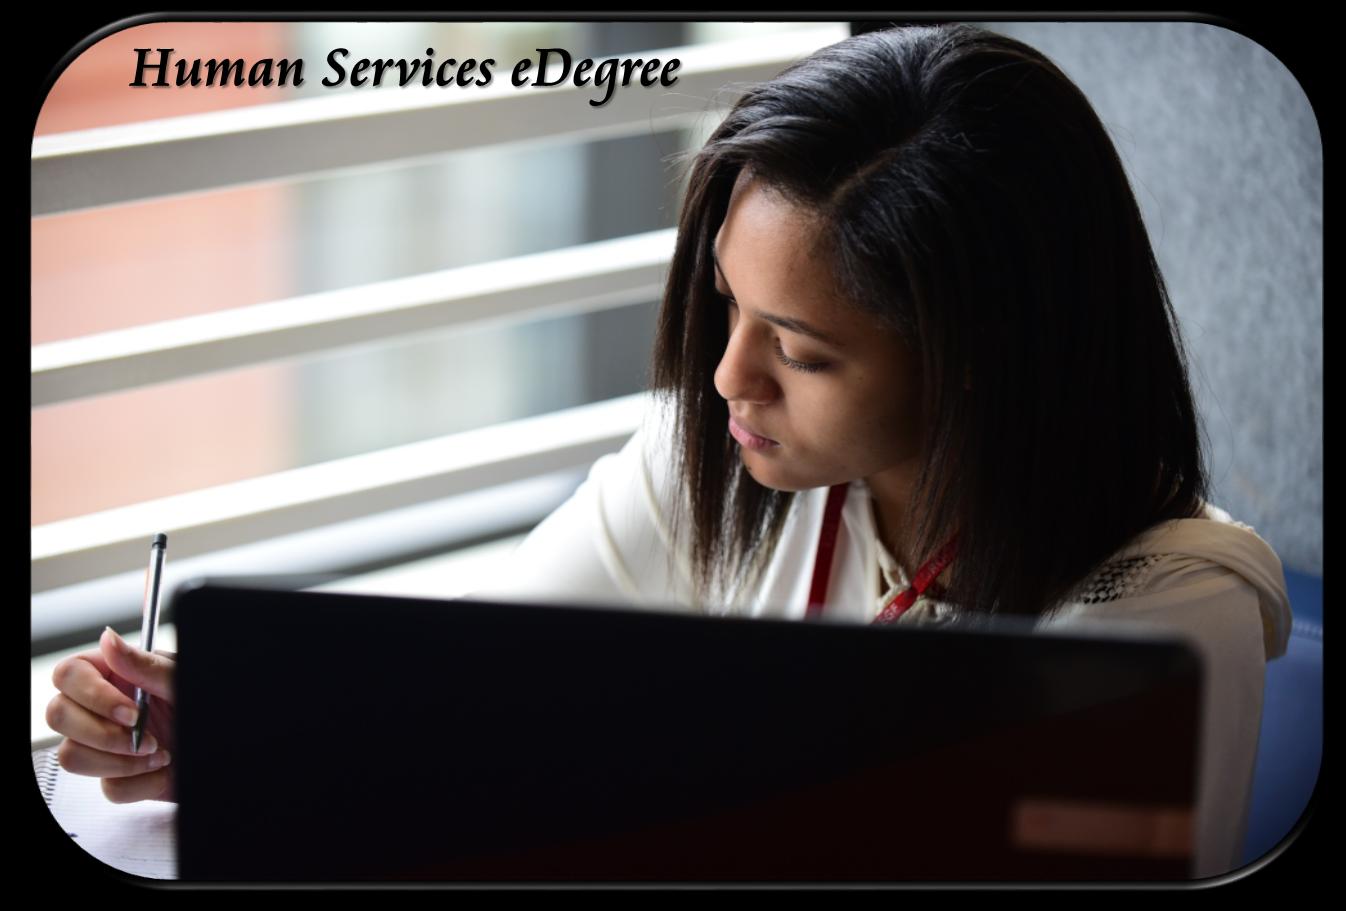 Human Services Online Program